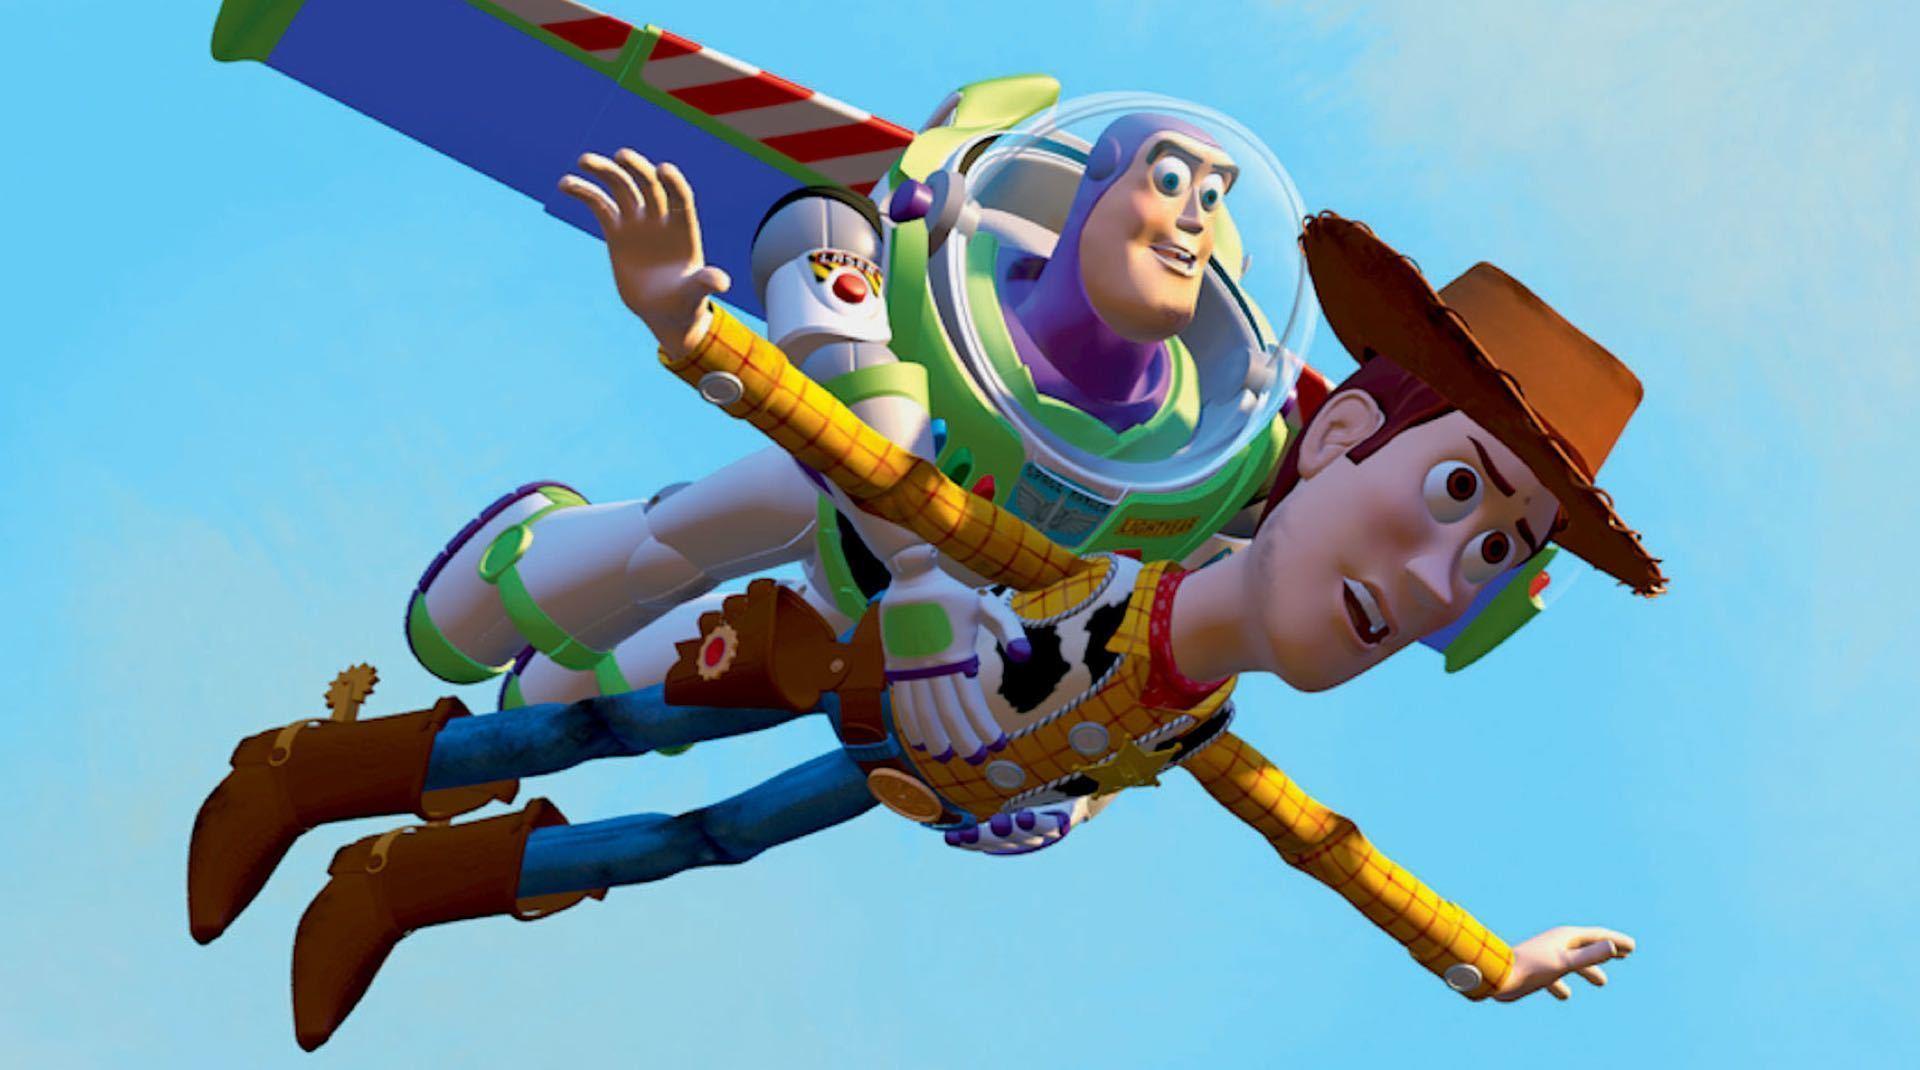 Un'immagine dal film Toy Story